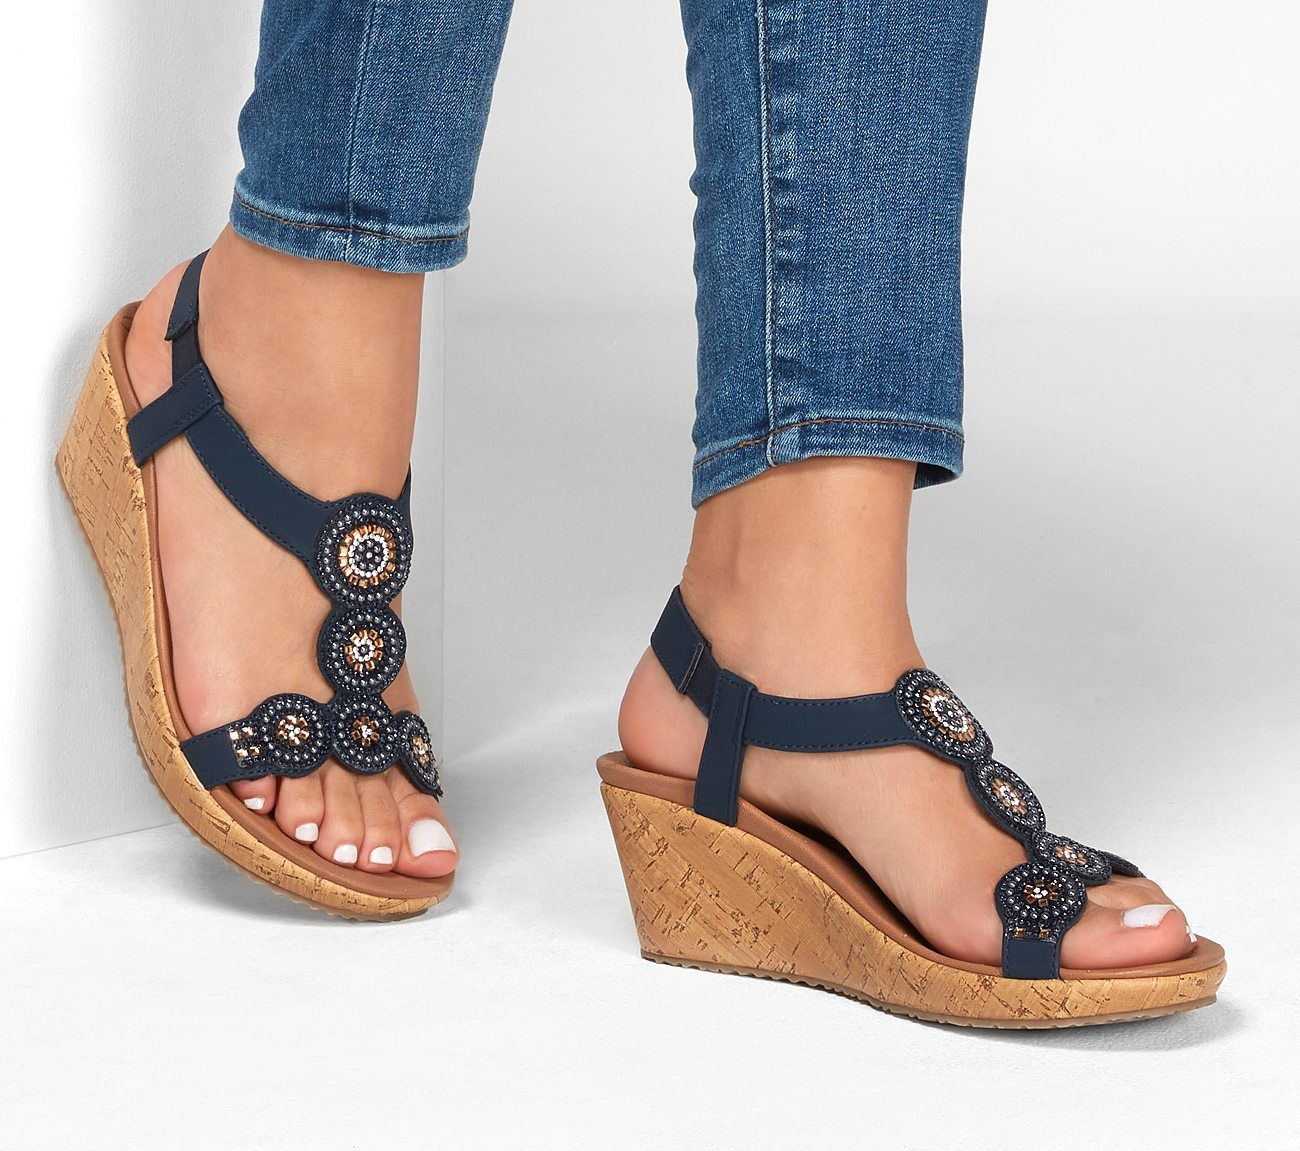 Shop The Beverlee Date Glam Sandal In 2020 Glam Sandals Skechers Women Fashion Slides